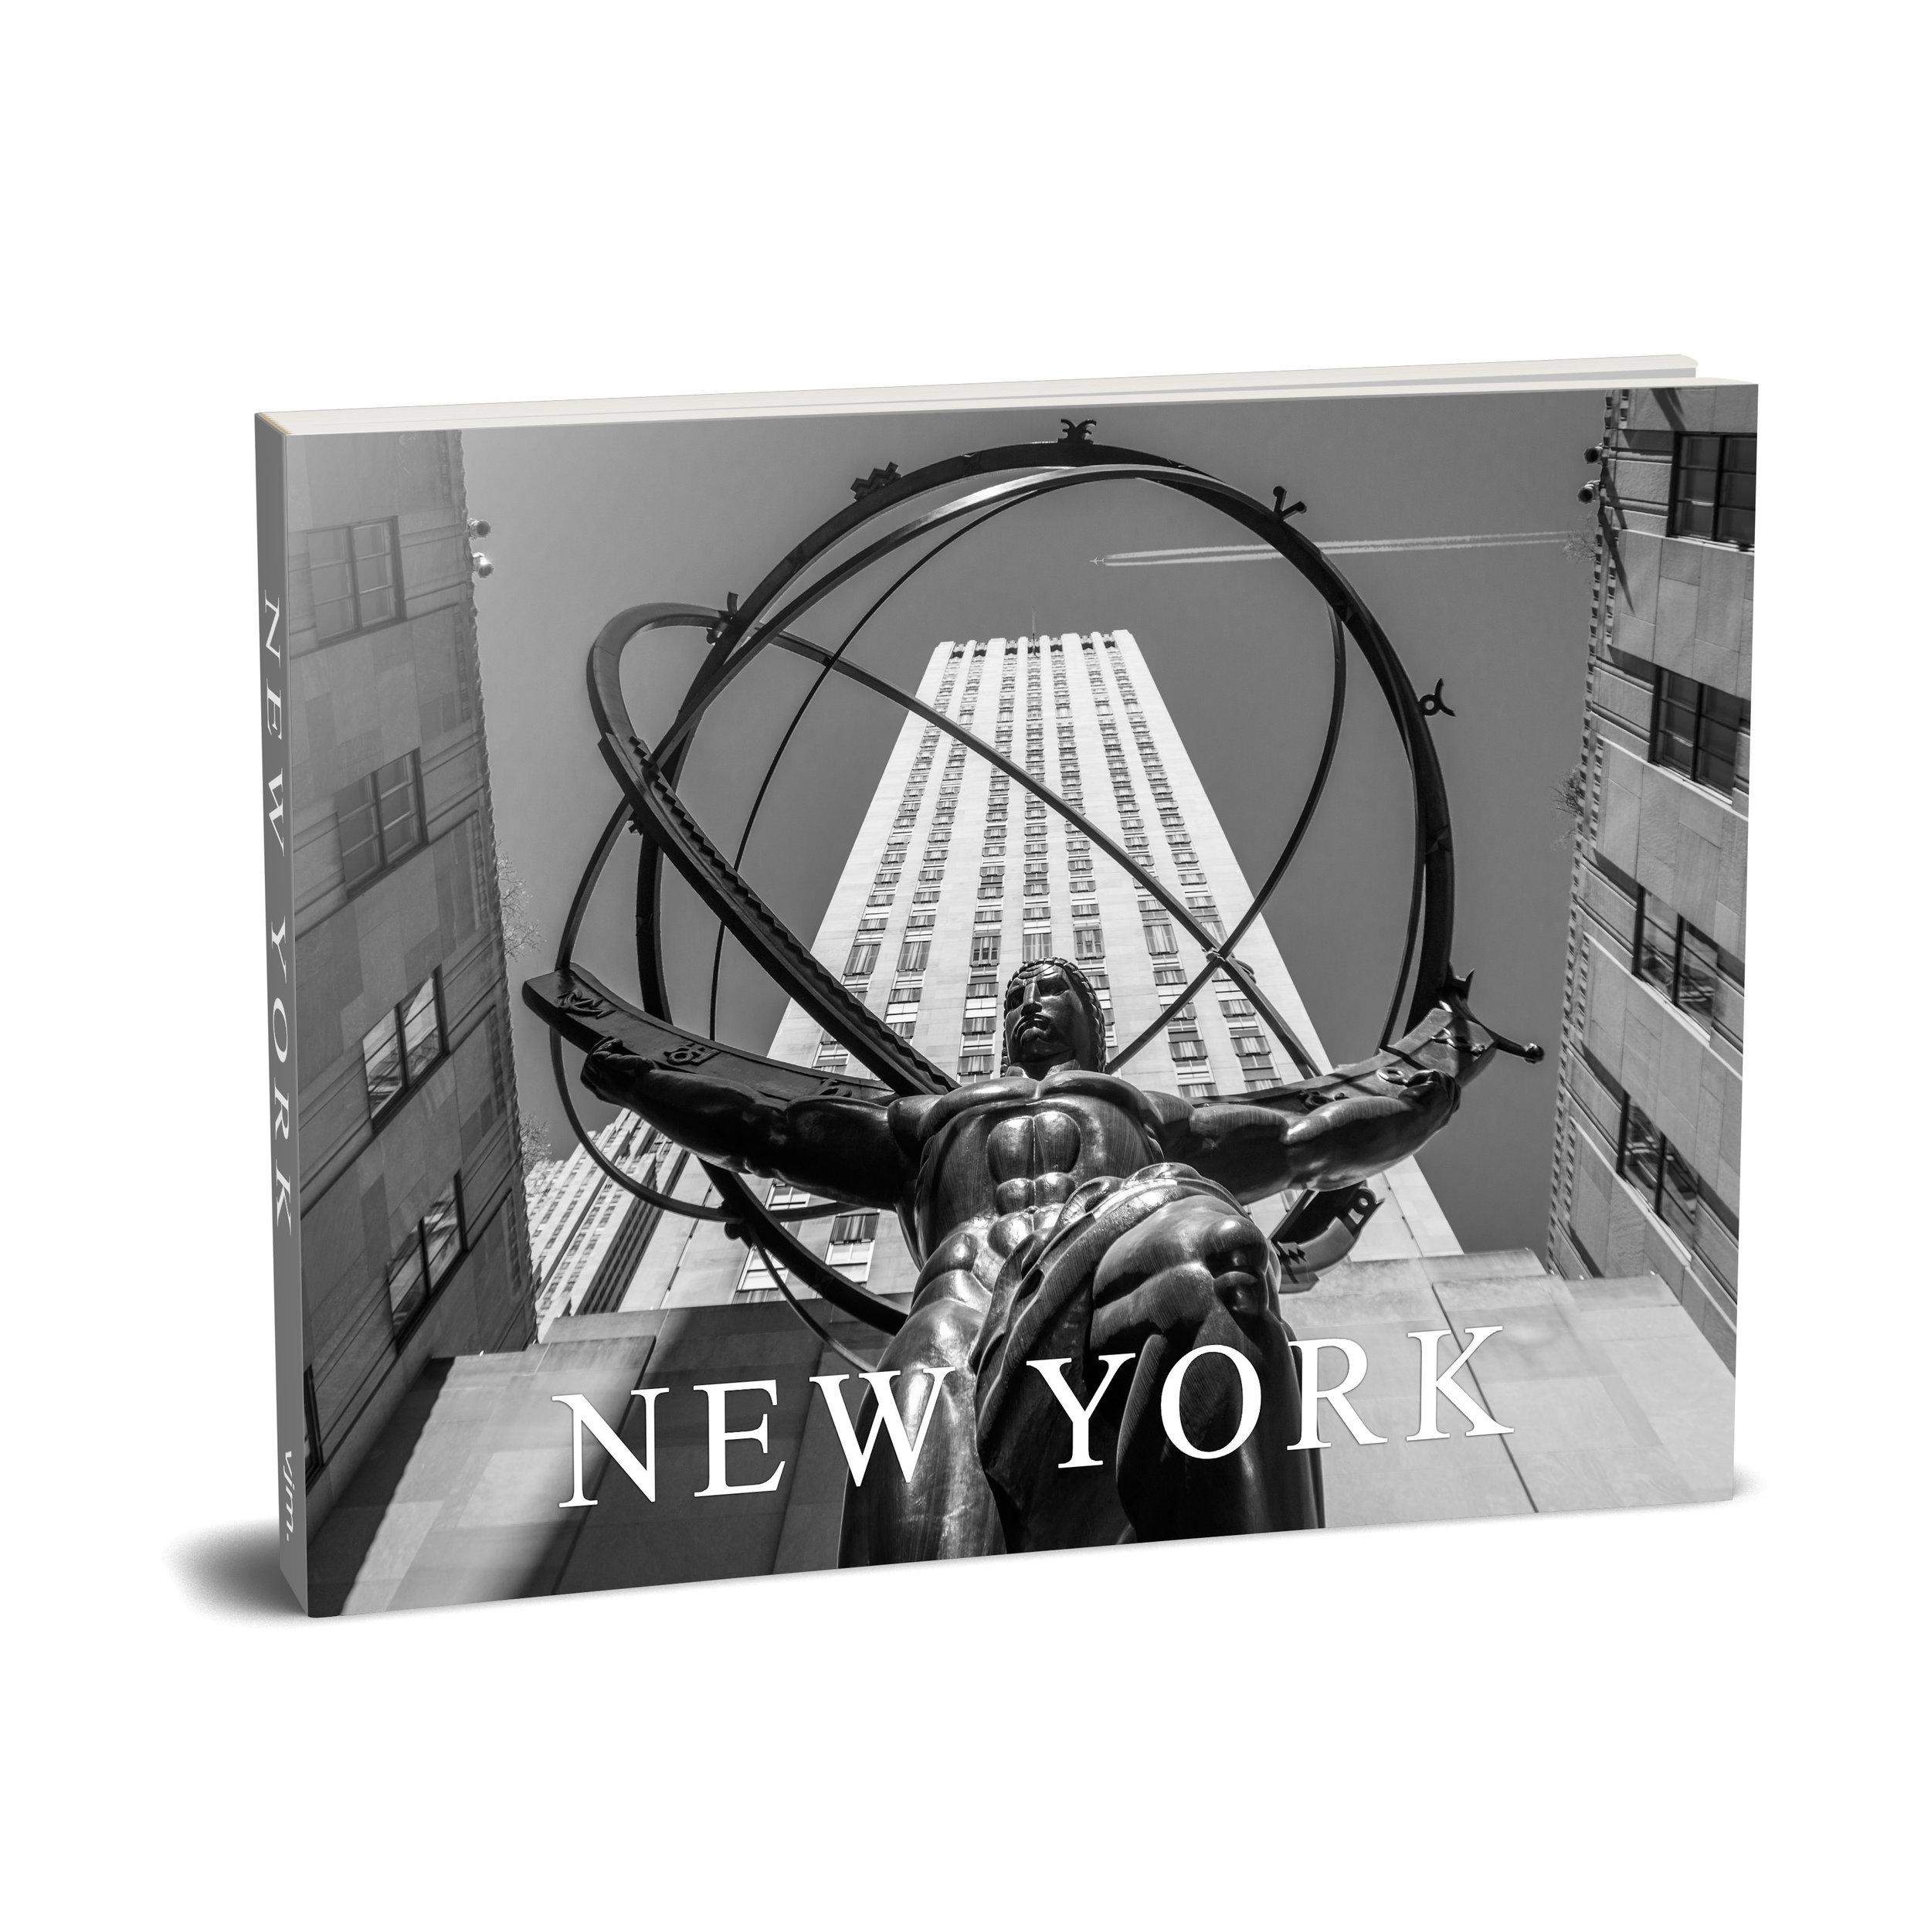 New-York-by-VJM-Book-Cover.jpg